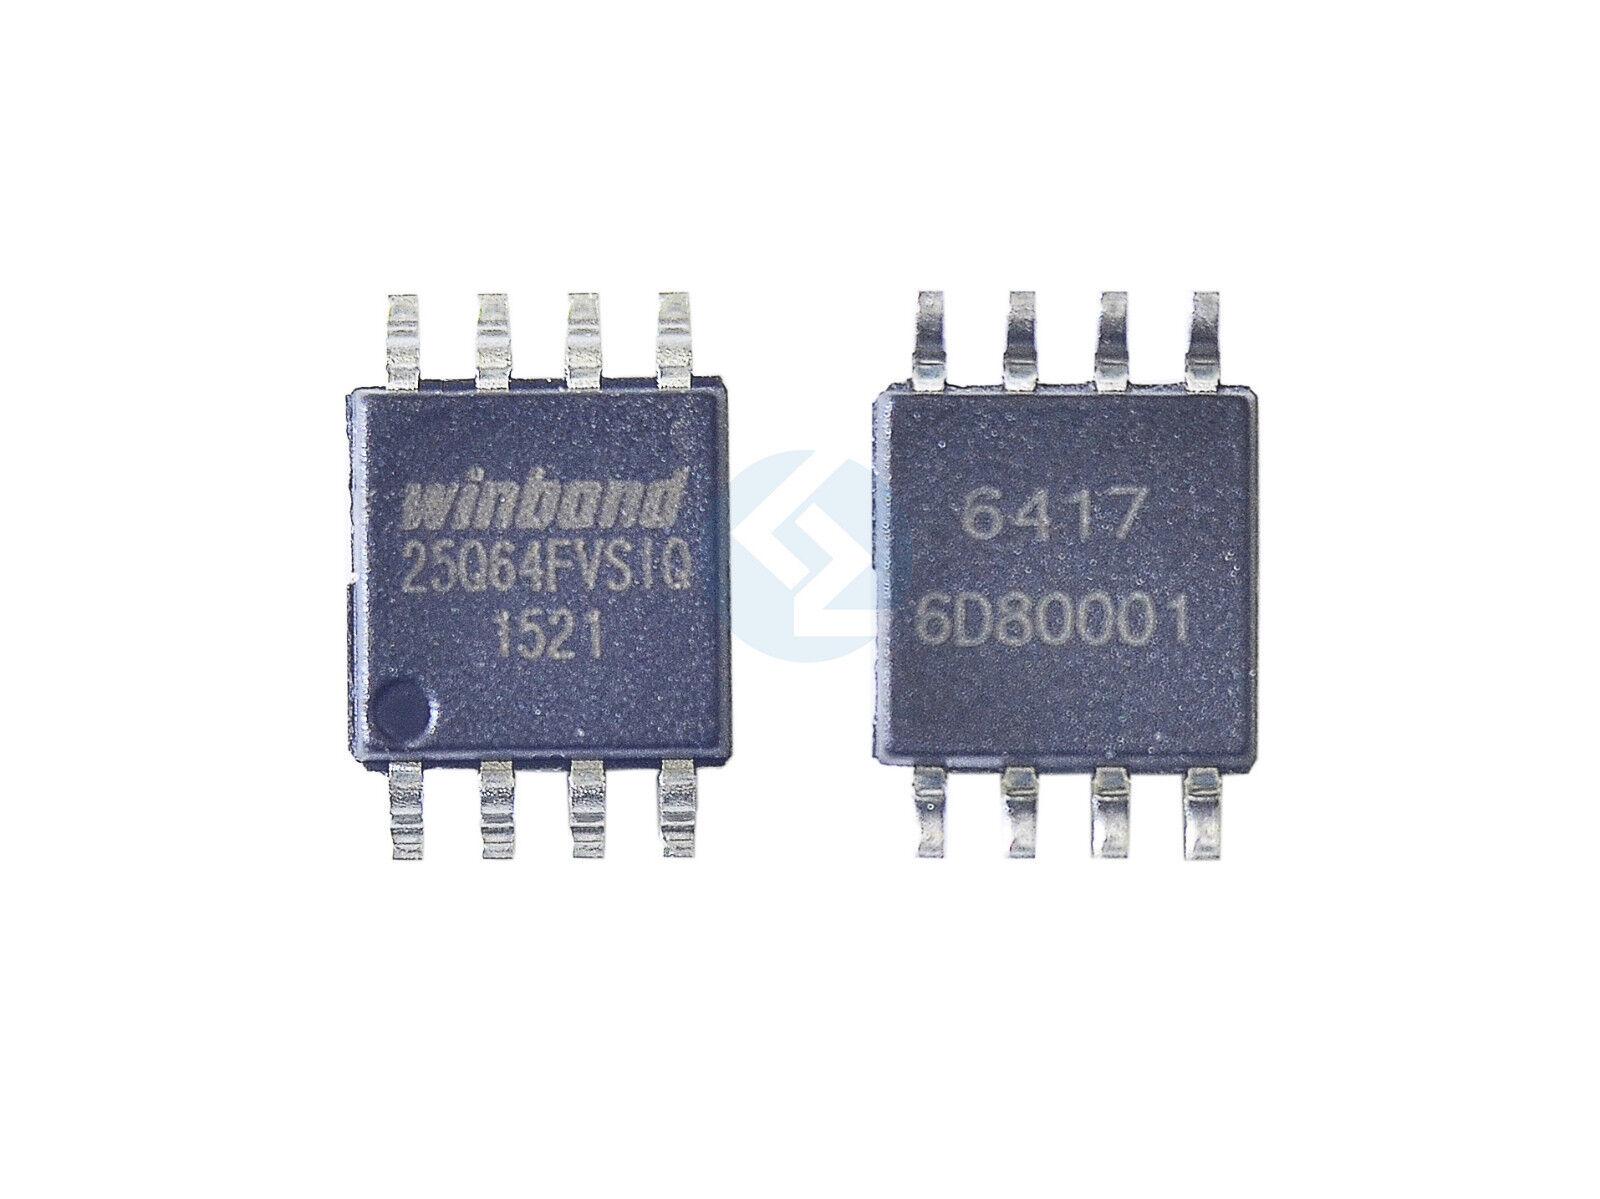 Lot of WINBOND W25Q64FVSIQ 25Q64FVSIQ SSOP 8pin Power IC Chip Chipse